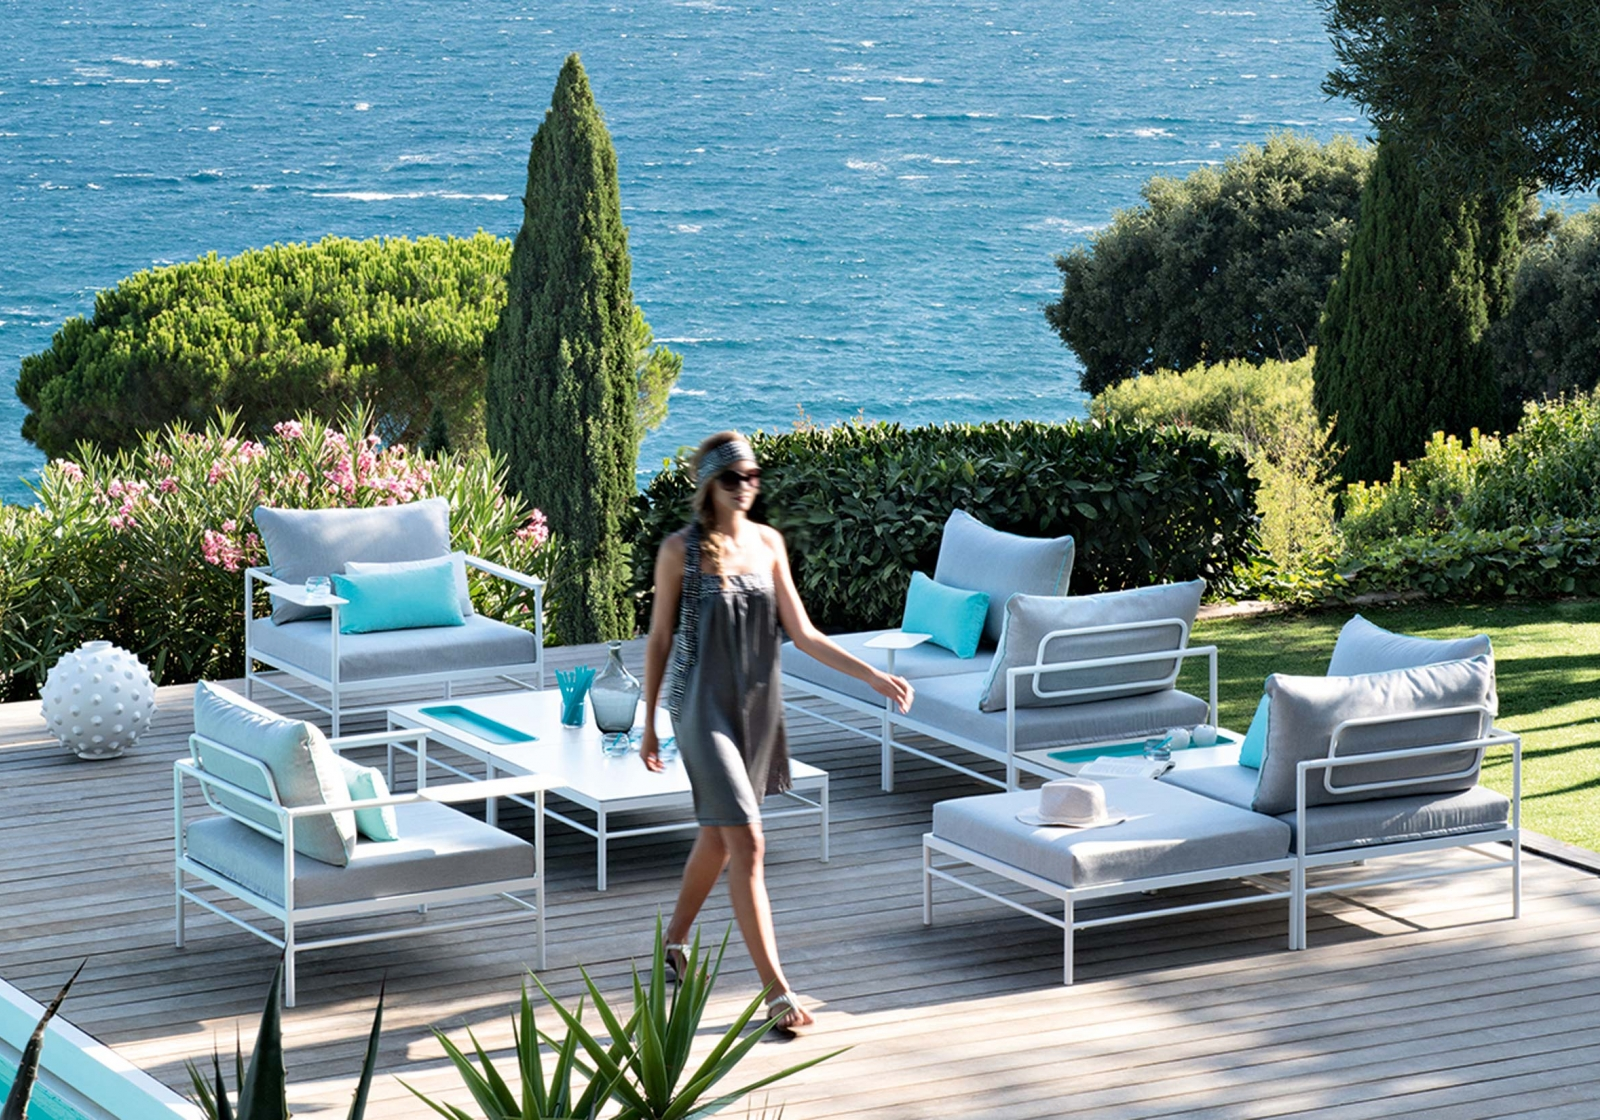 mobilier de jardin fran ais vlaemynck lyon magasin de. Black Bedroom Furniture Sets. Home Design Ideas